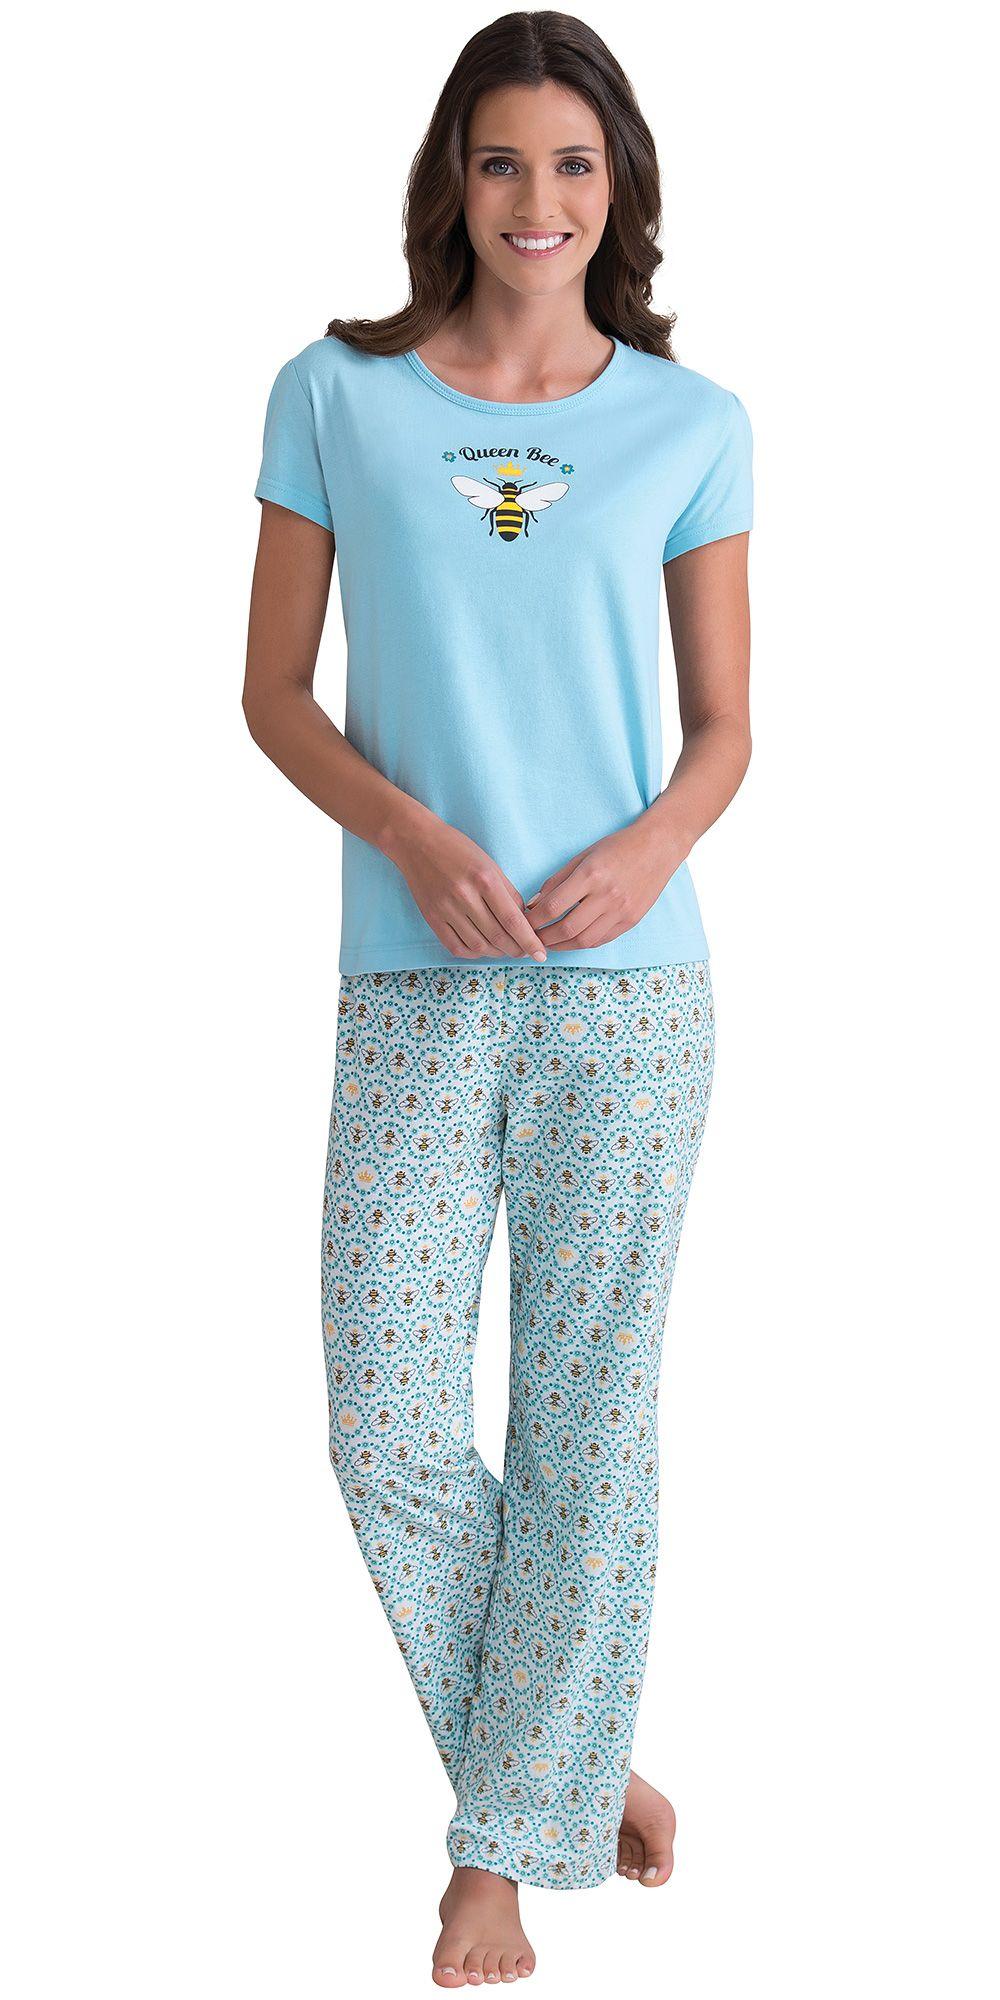 be3f94f19e7c77 Queen Bee Pajamas Pjs An Sleepy Time Pinterest Queen Bees